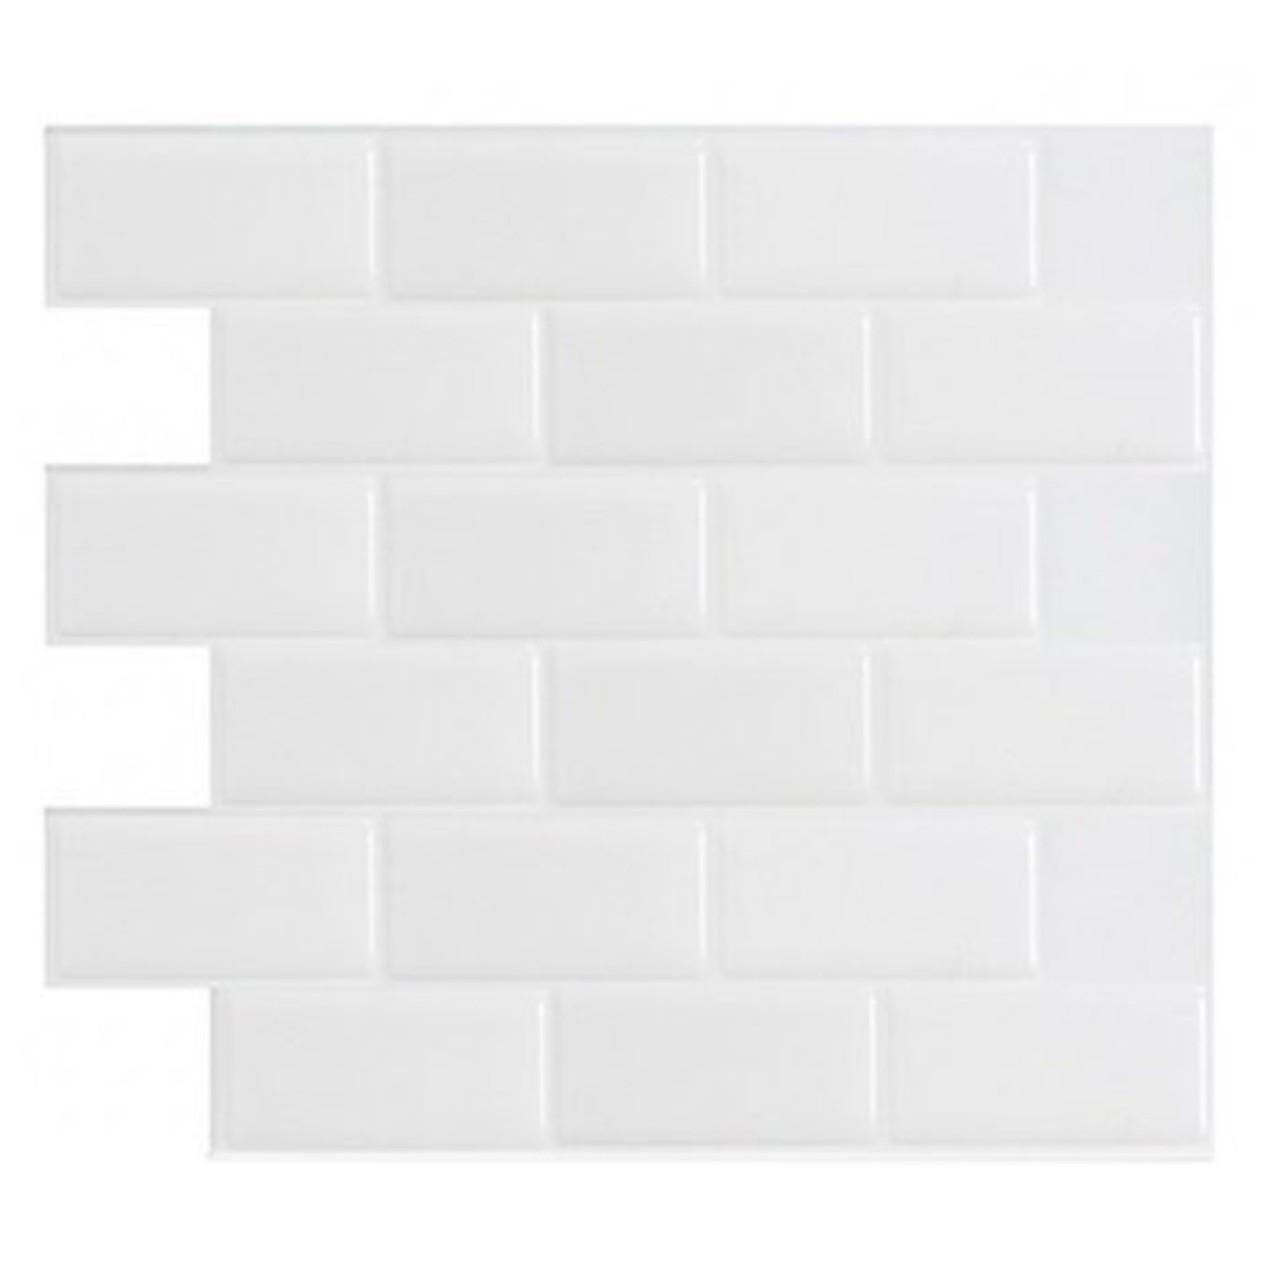 Art3d 12 X 12 Self Adhesive Backsplash Subway Tiles White 10